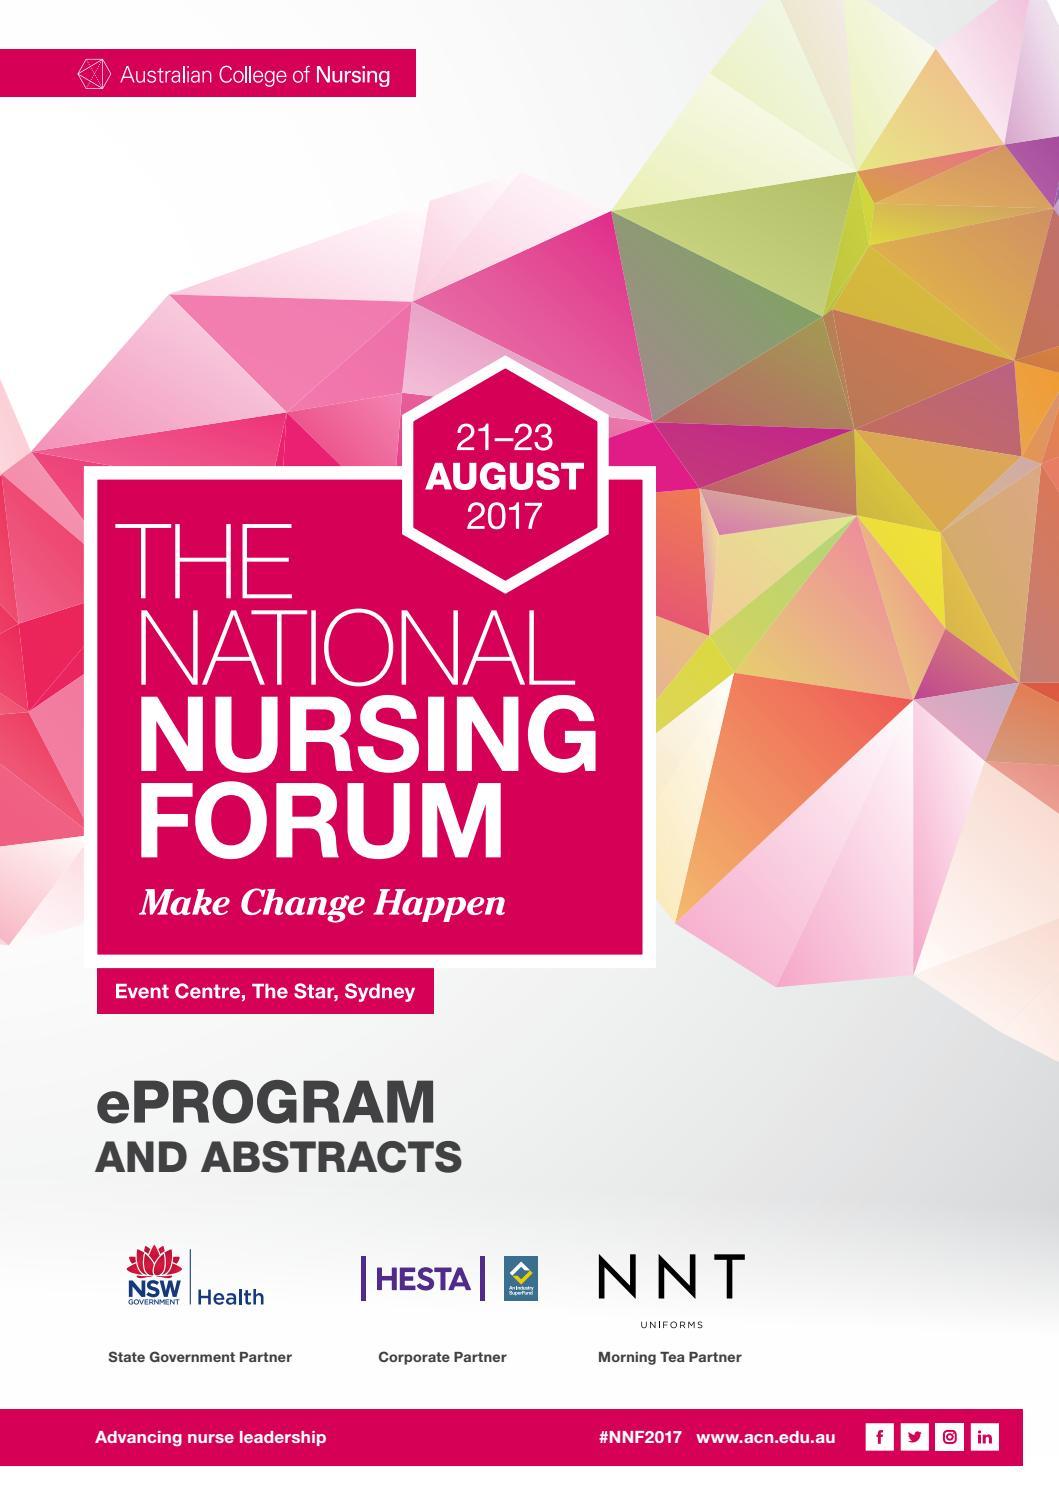 2017 national nursing forum eprogram by acn australian college of 2017 national nursing forum eprogram by acn australian college of nursing issuu fandeluxe Images